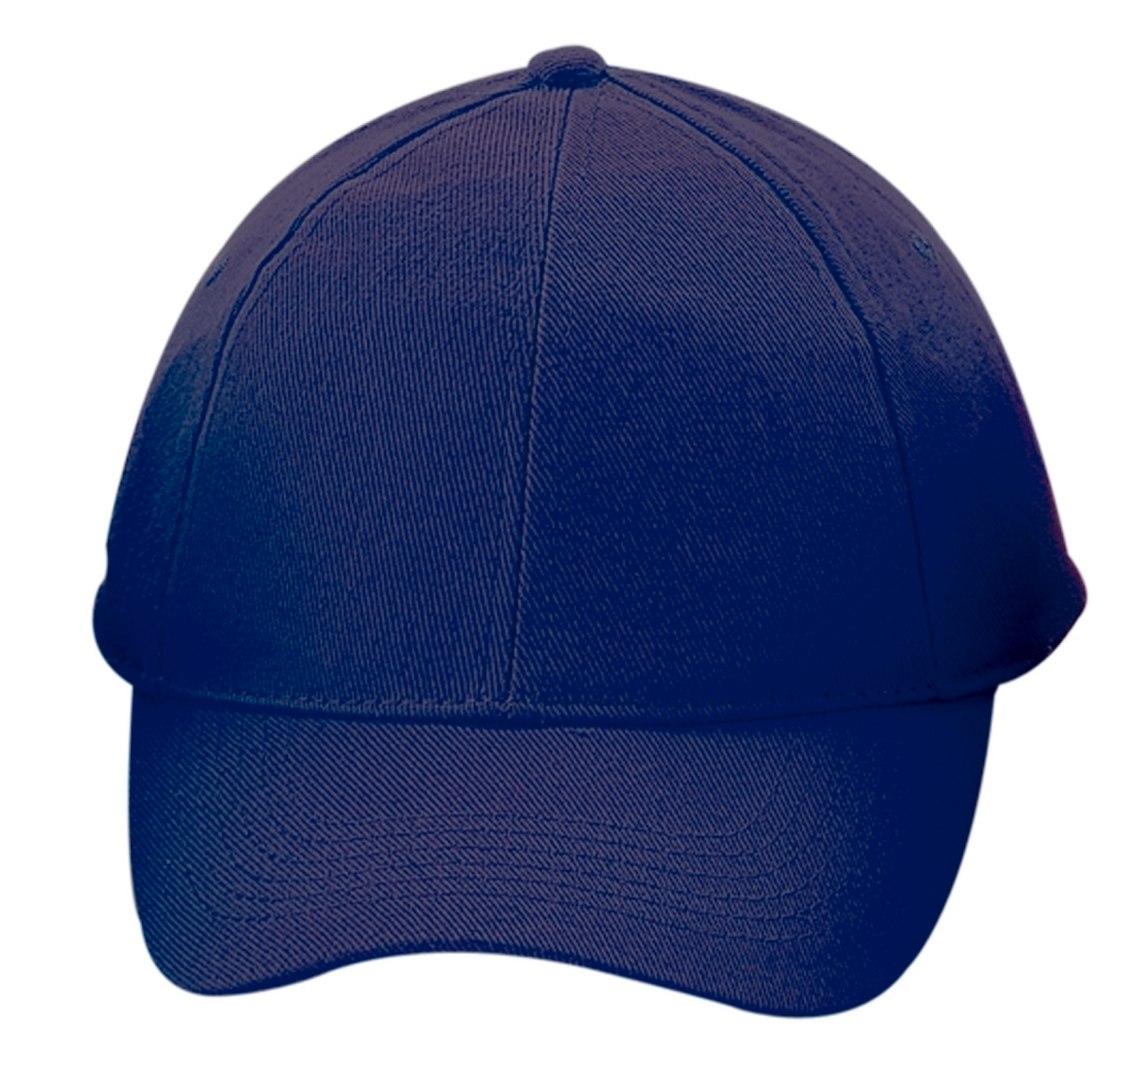 Kit X3 Gorra Cachucha Beisbol 6 Cascos 4 Ojetes -azul Oscuro ... 6a6fd323000